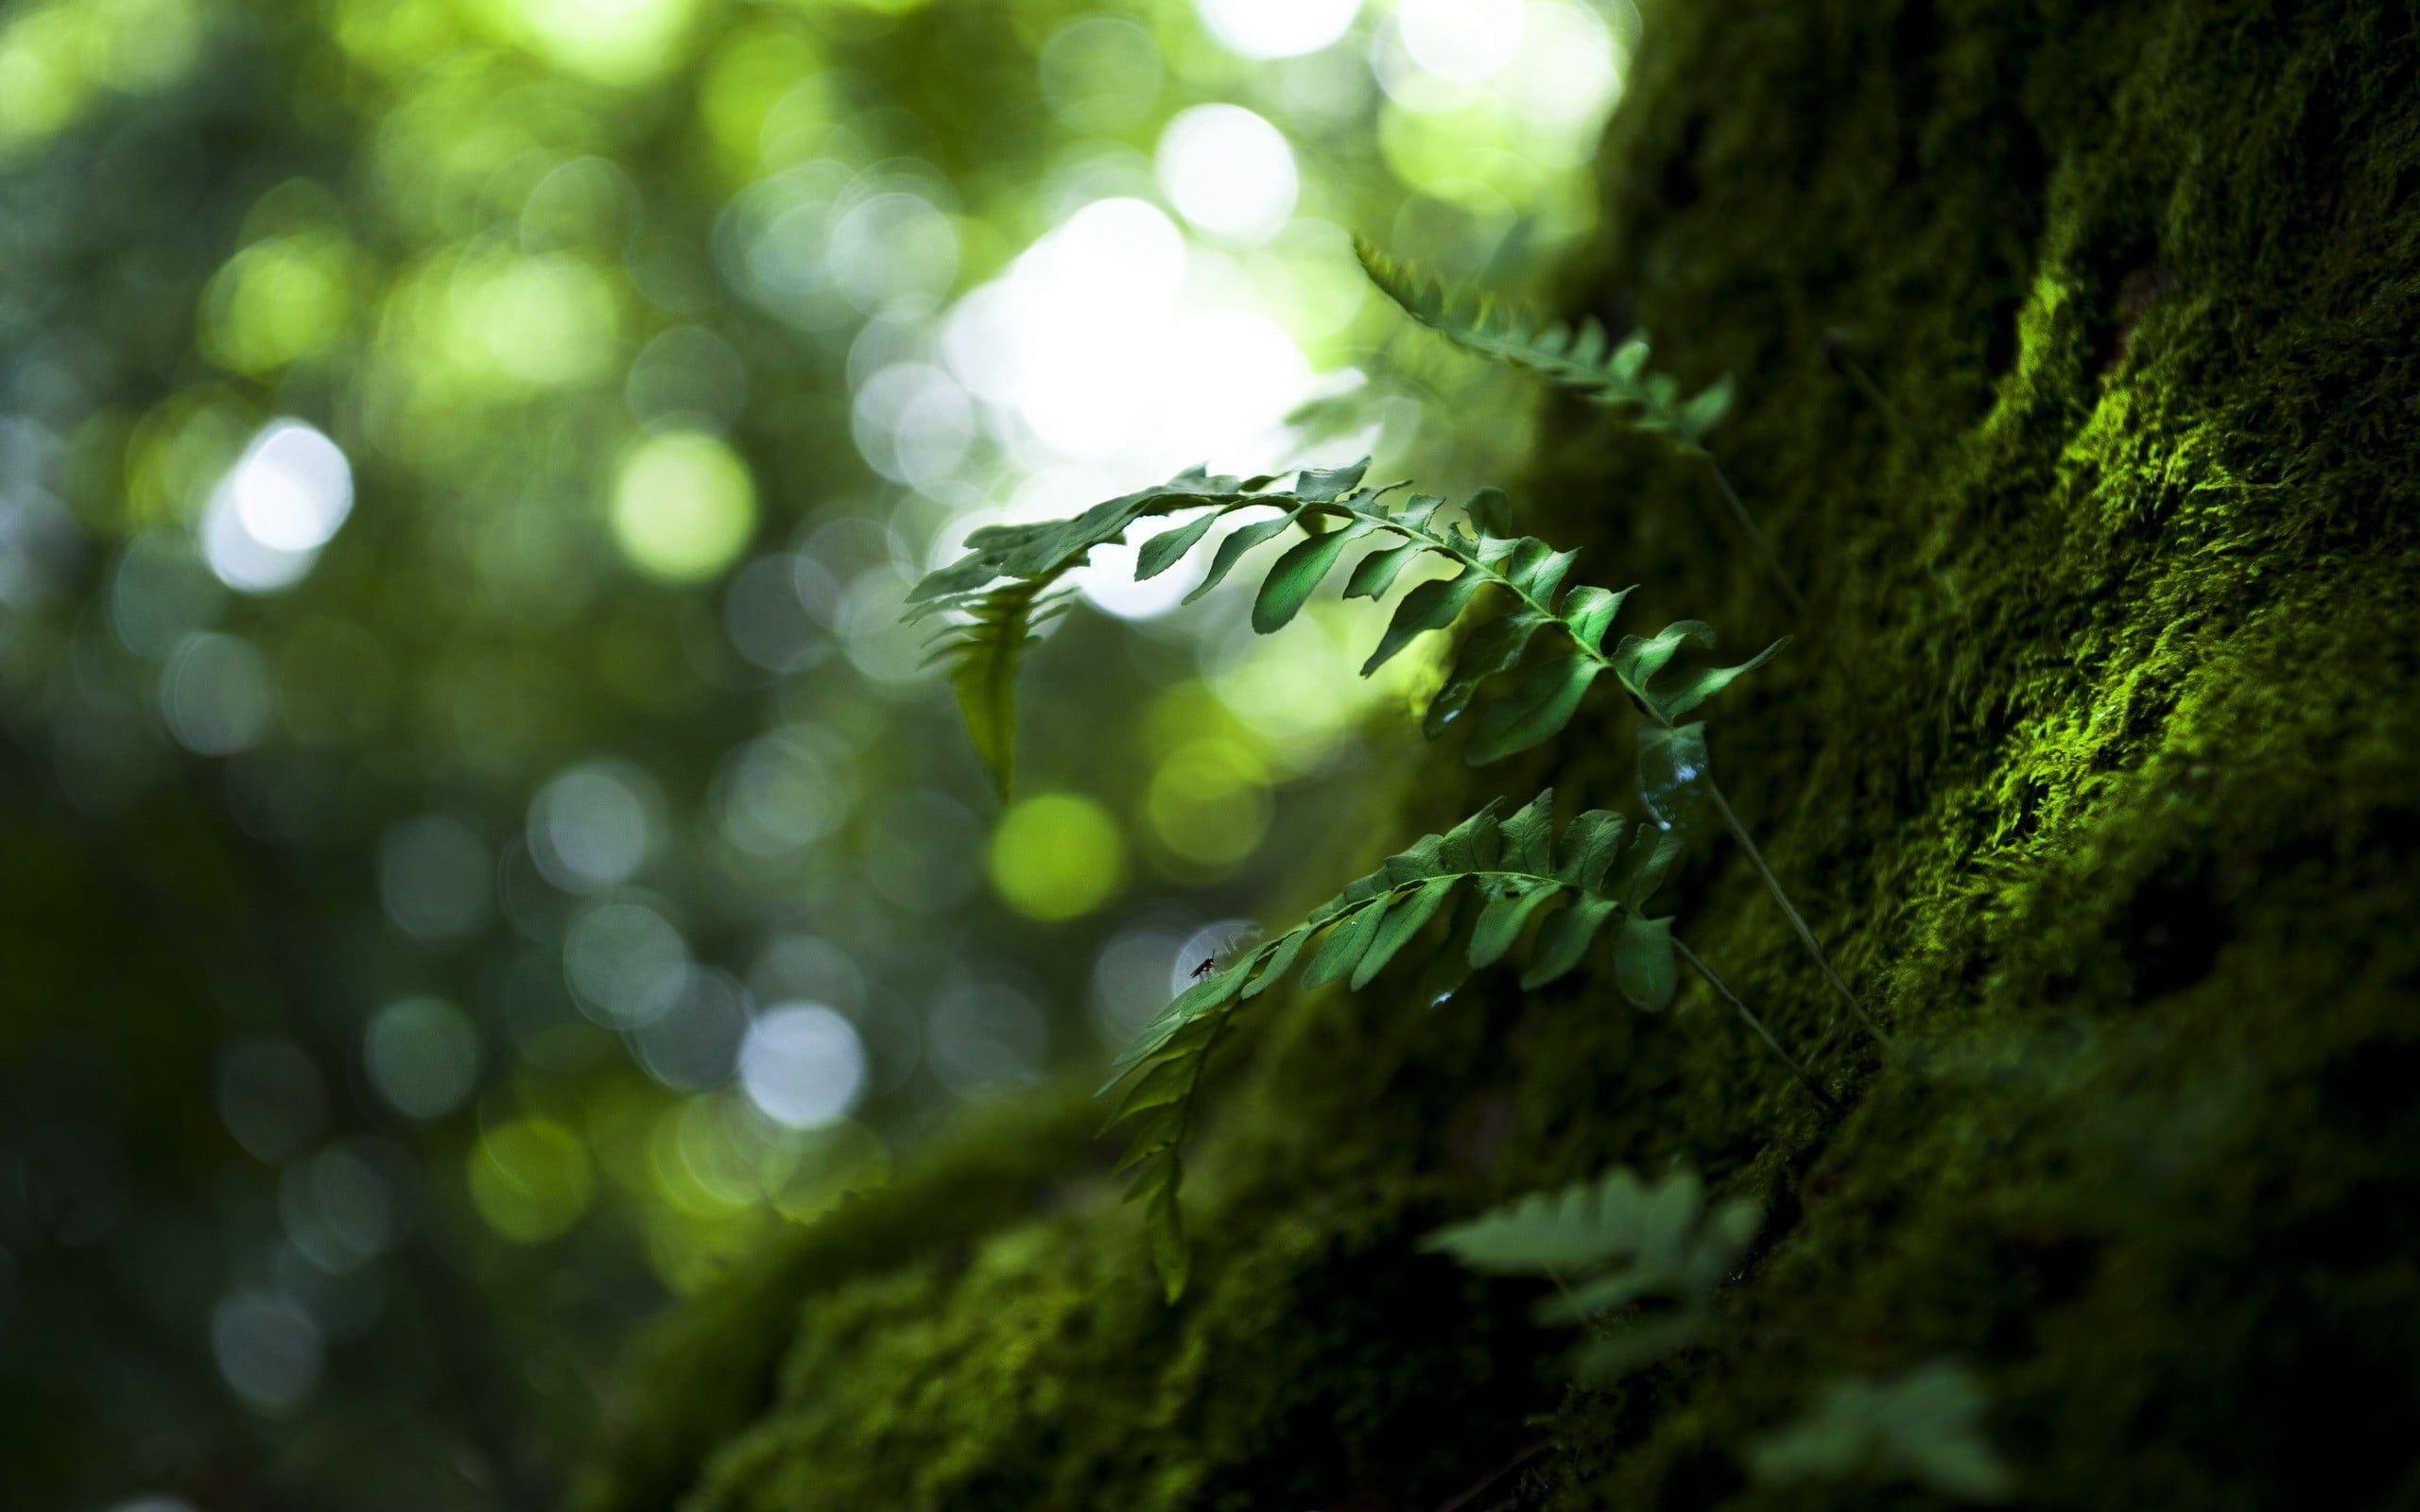 Green Leafed Plant Leaves Blurred Depth Of Field Macro Photography Sunlight Bokeh 2k Wallpaper Hdw Macro Photography Wallpaper Plant Background Plants